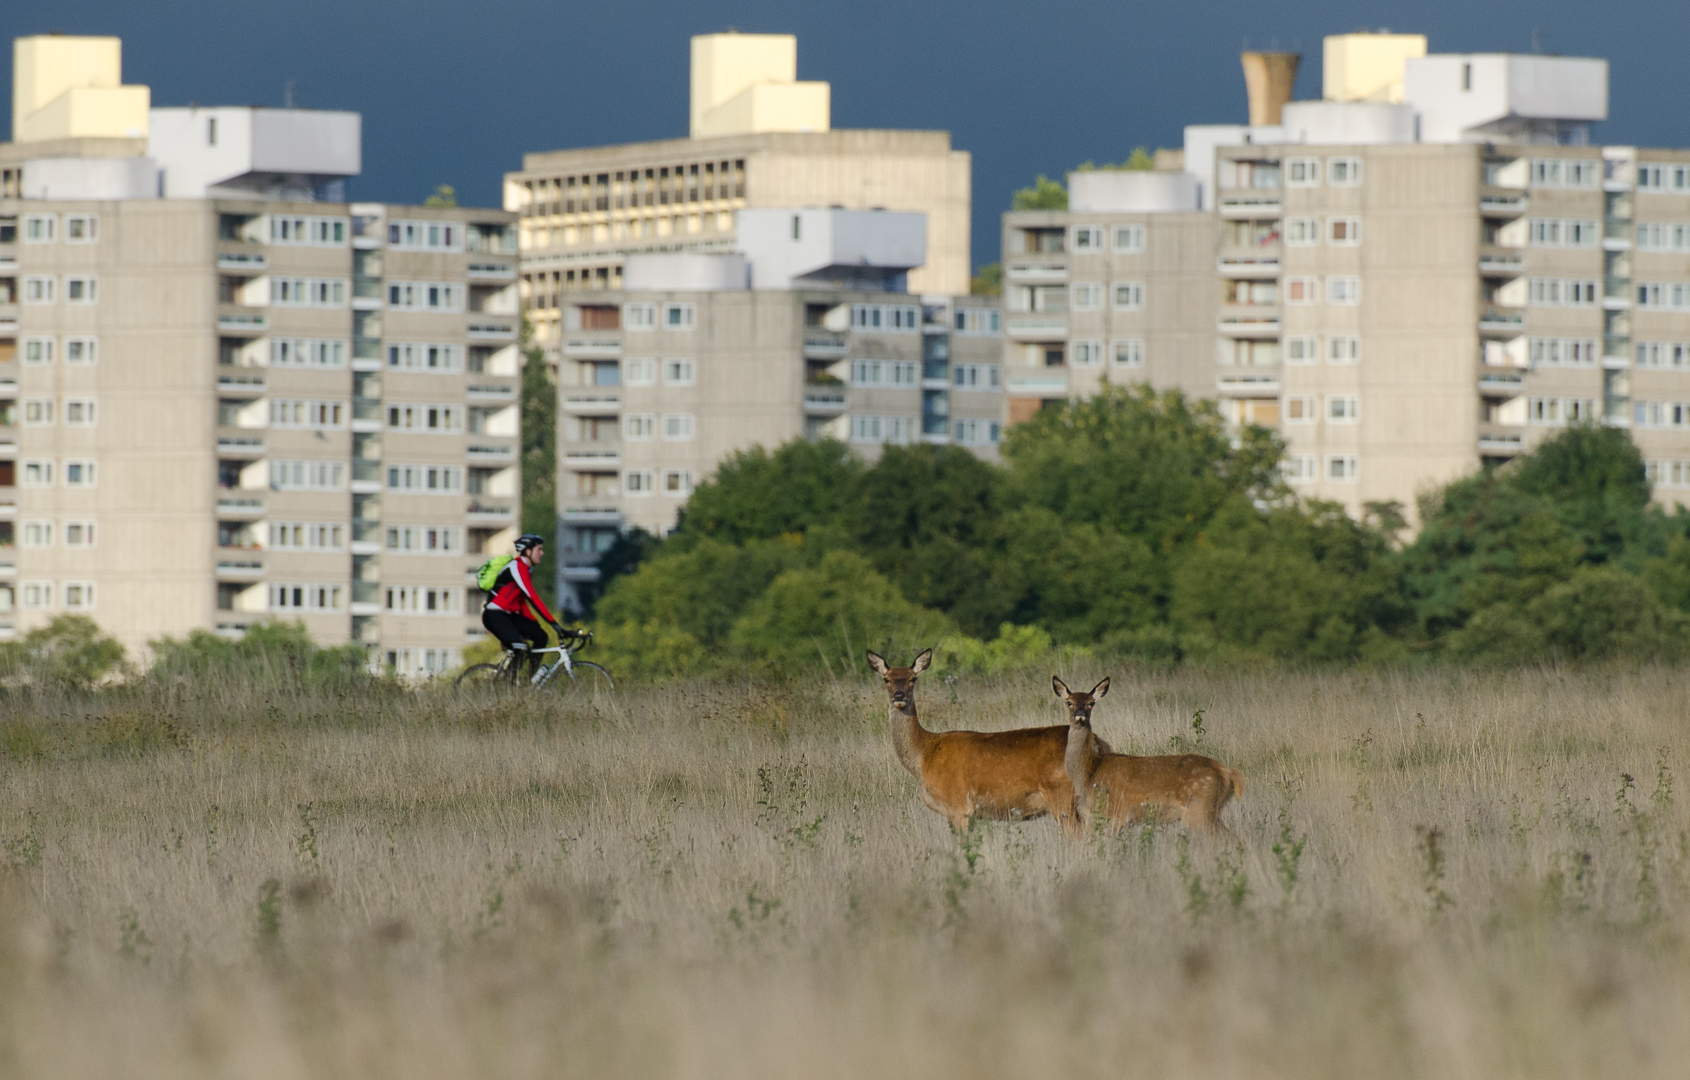 Red deer in Richmond park, London.